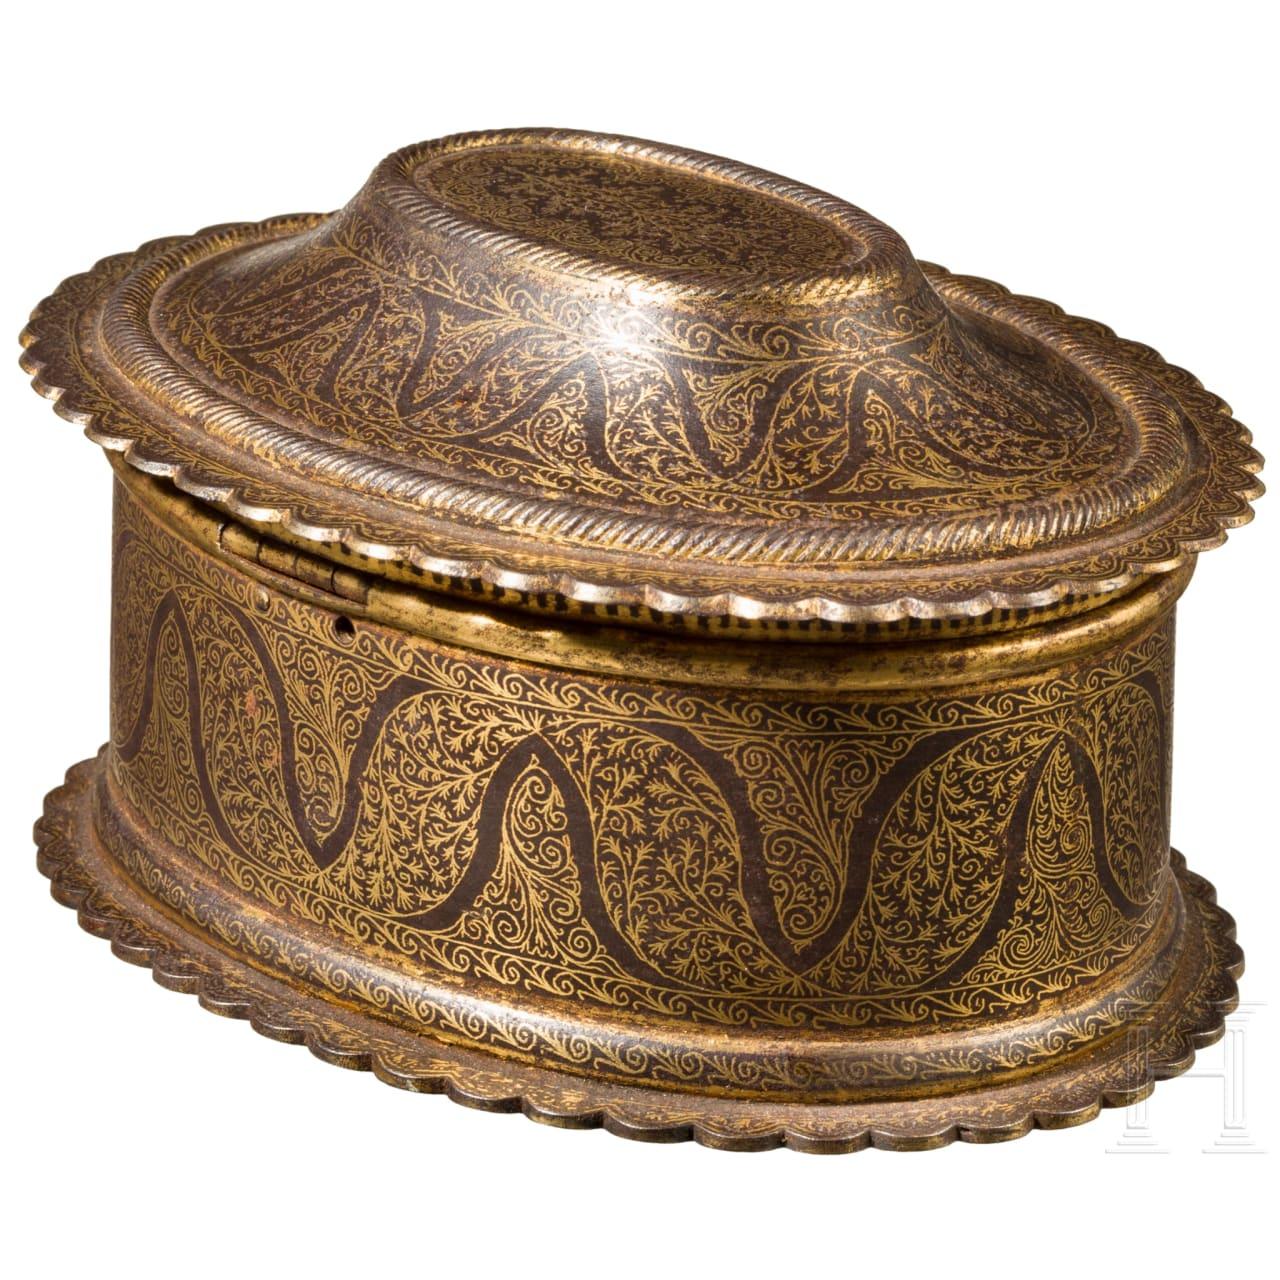 An Indian gold-damascened casket, Rajasthan, 19th century